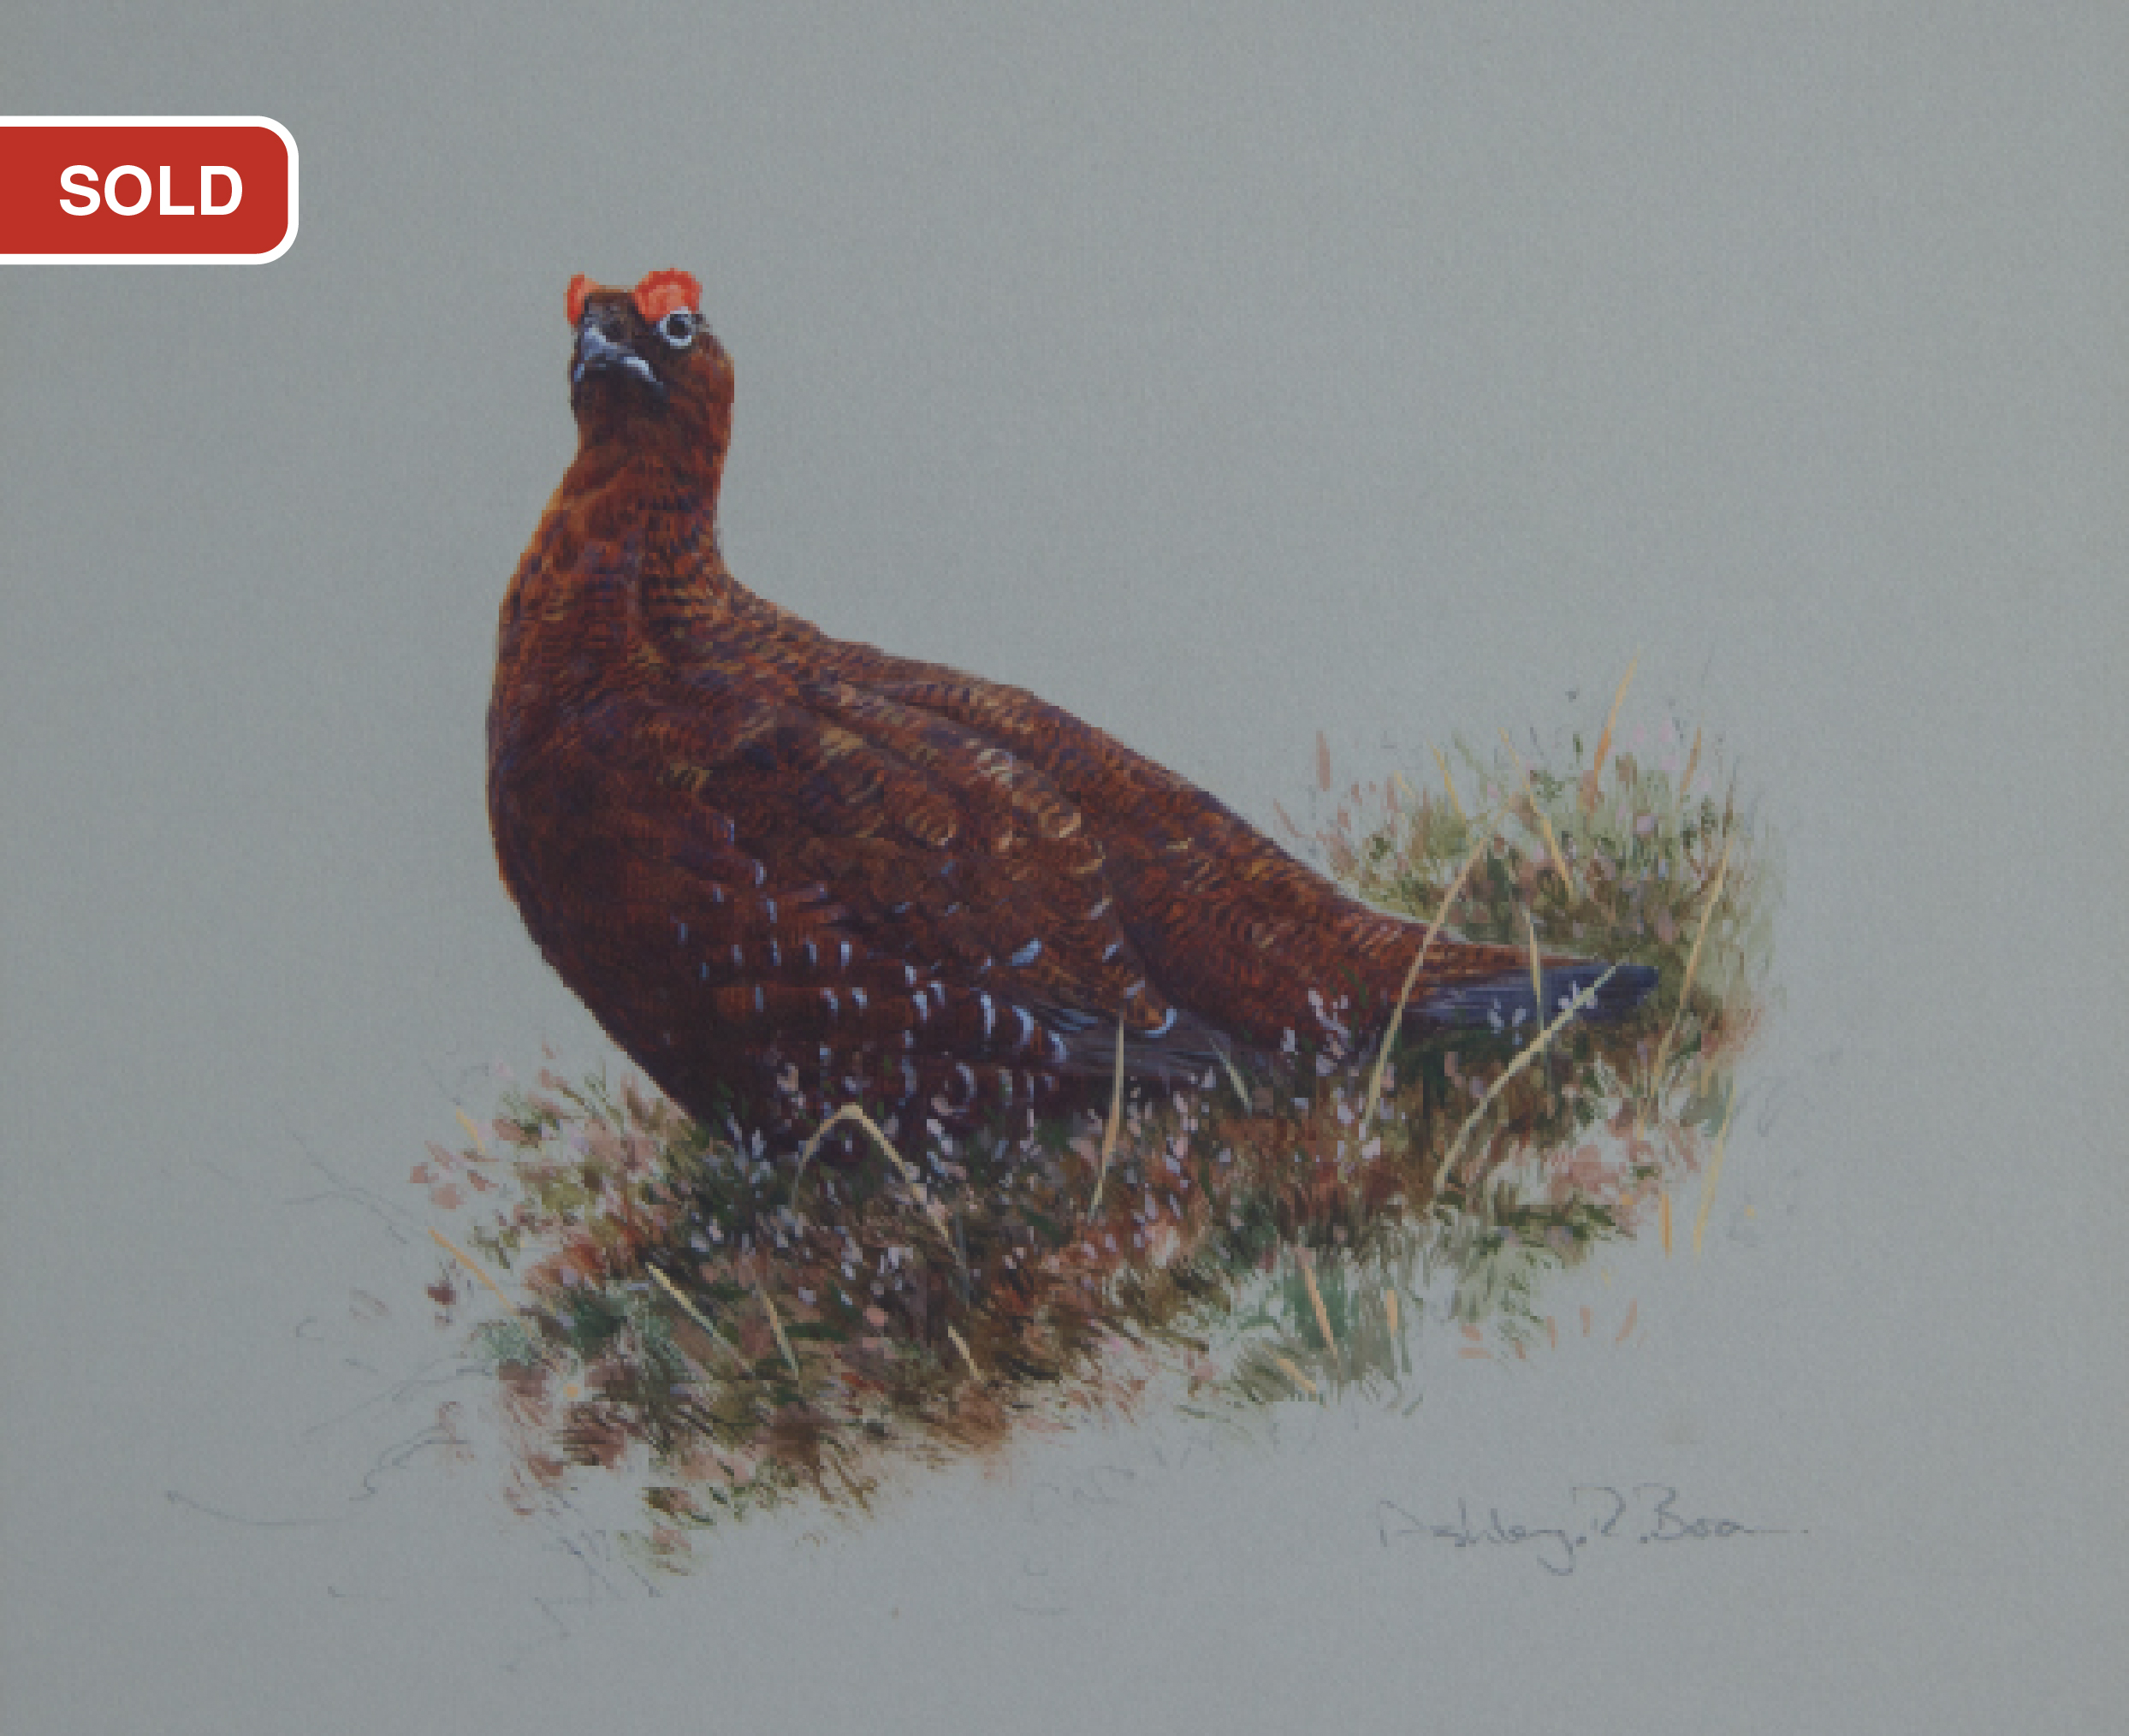 Red Grouse/ Driven Grouse, Grouse Shooting/ Images/Paintings/Art Getriebene Moorschneehühner/ Kunst/ Bild/ Gemälde